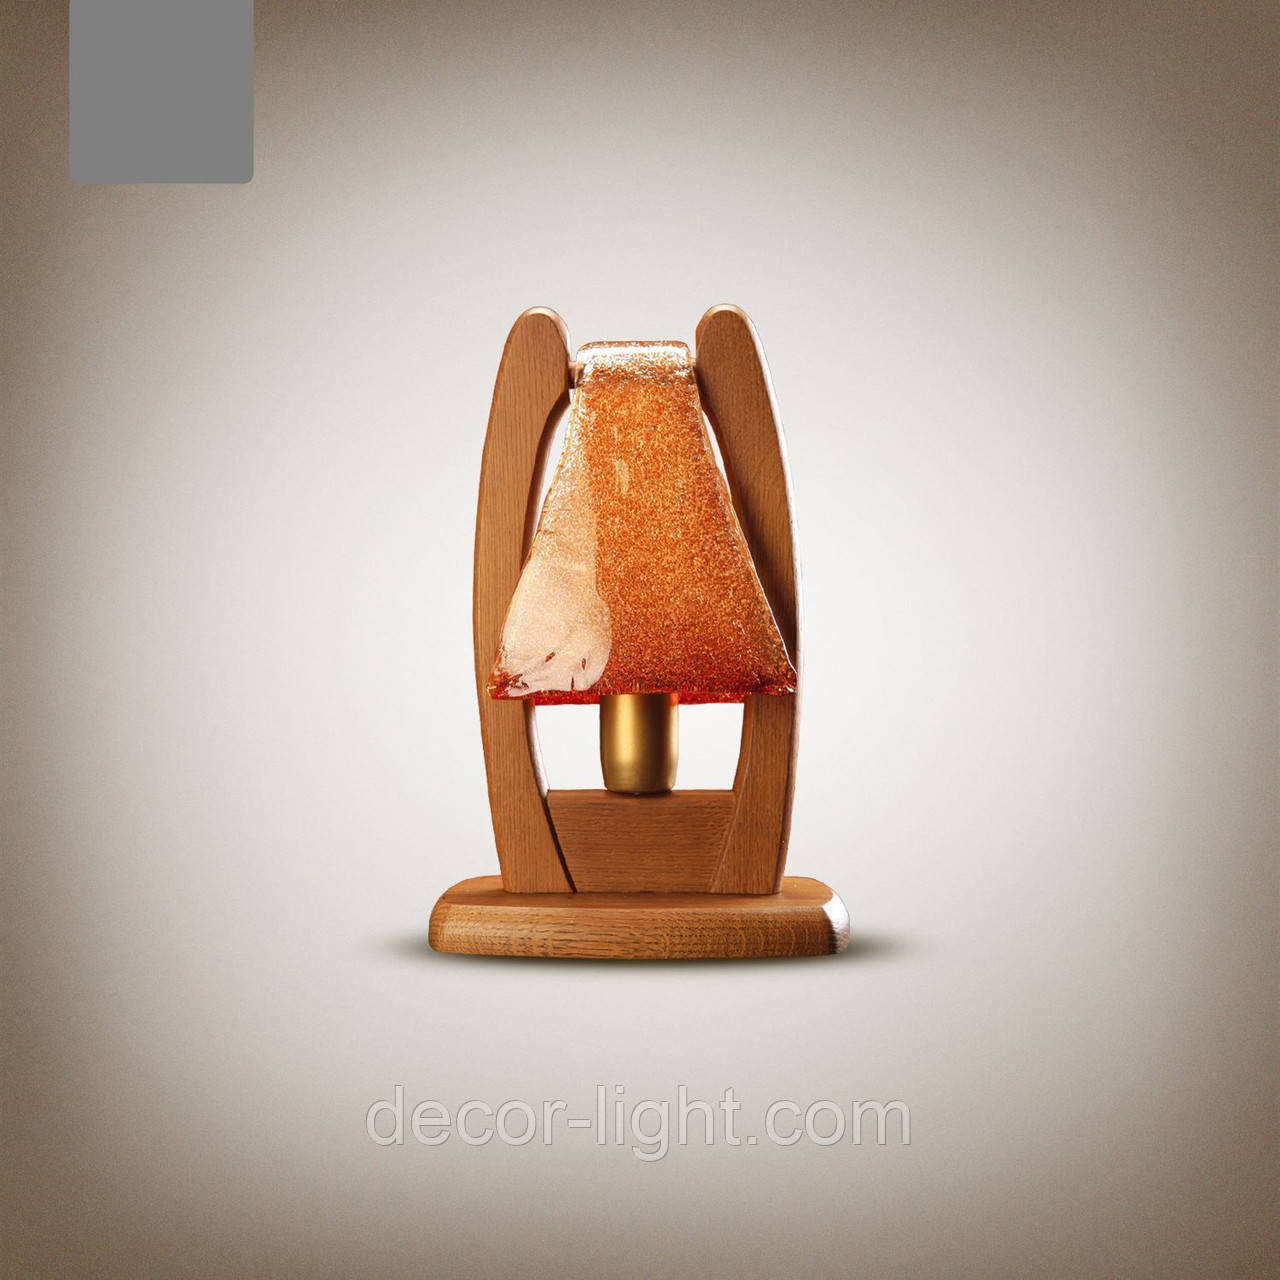 Настольная лампа деревянная  1401-1